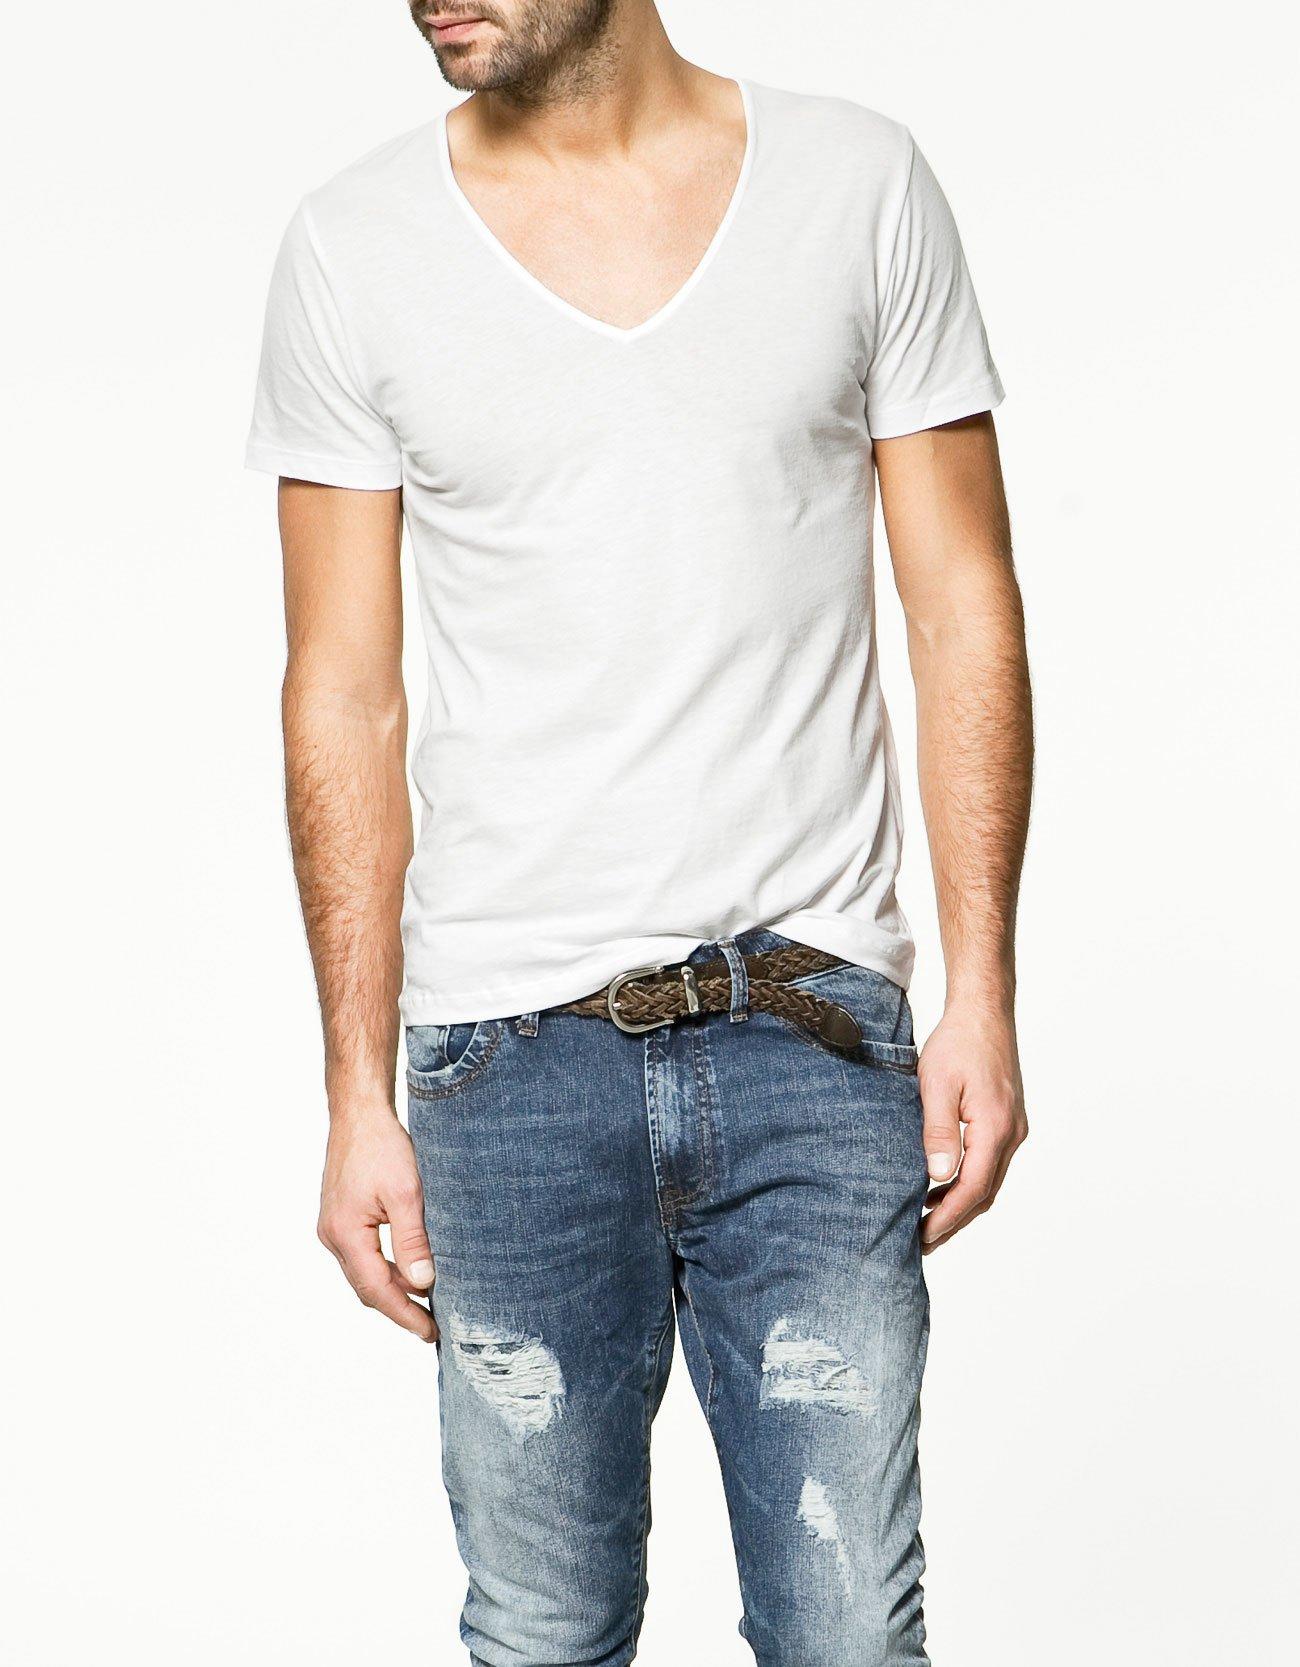 Zara t shirts mens